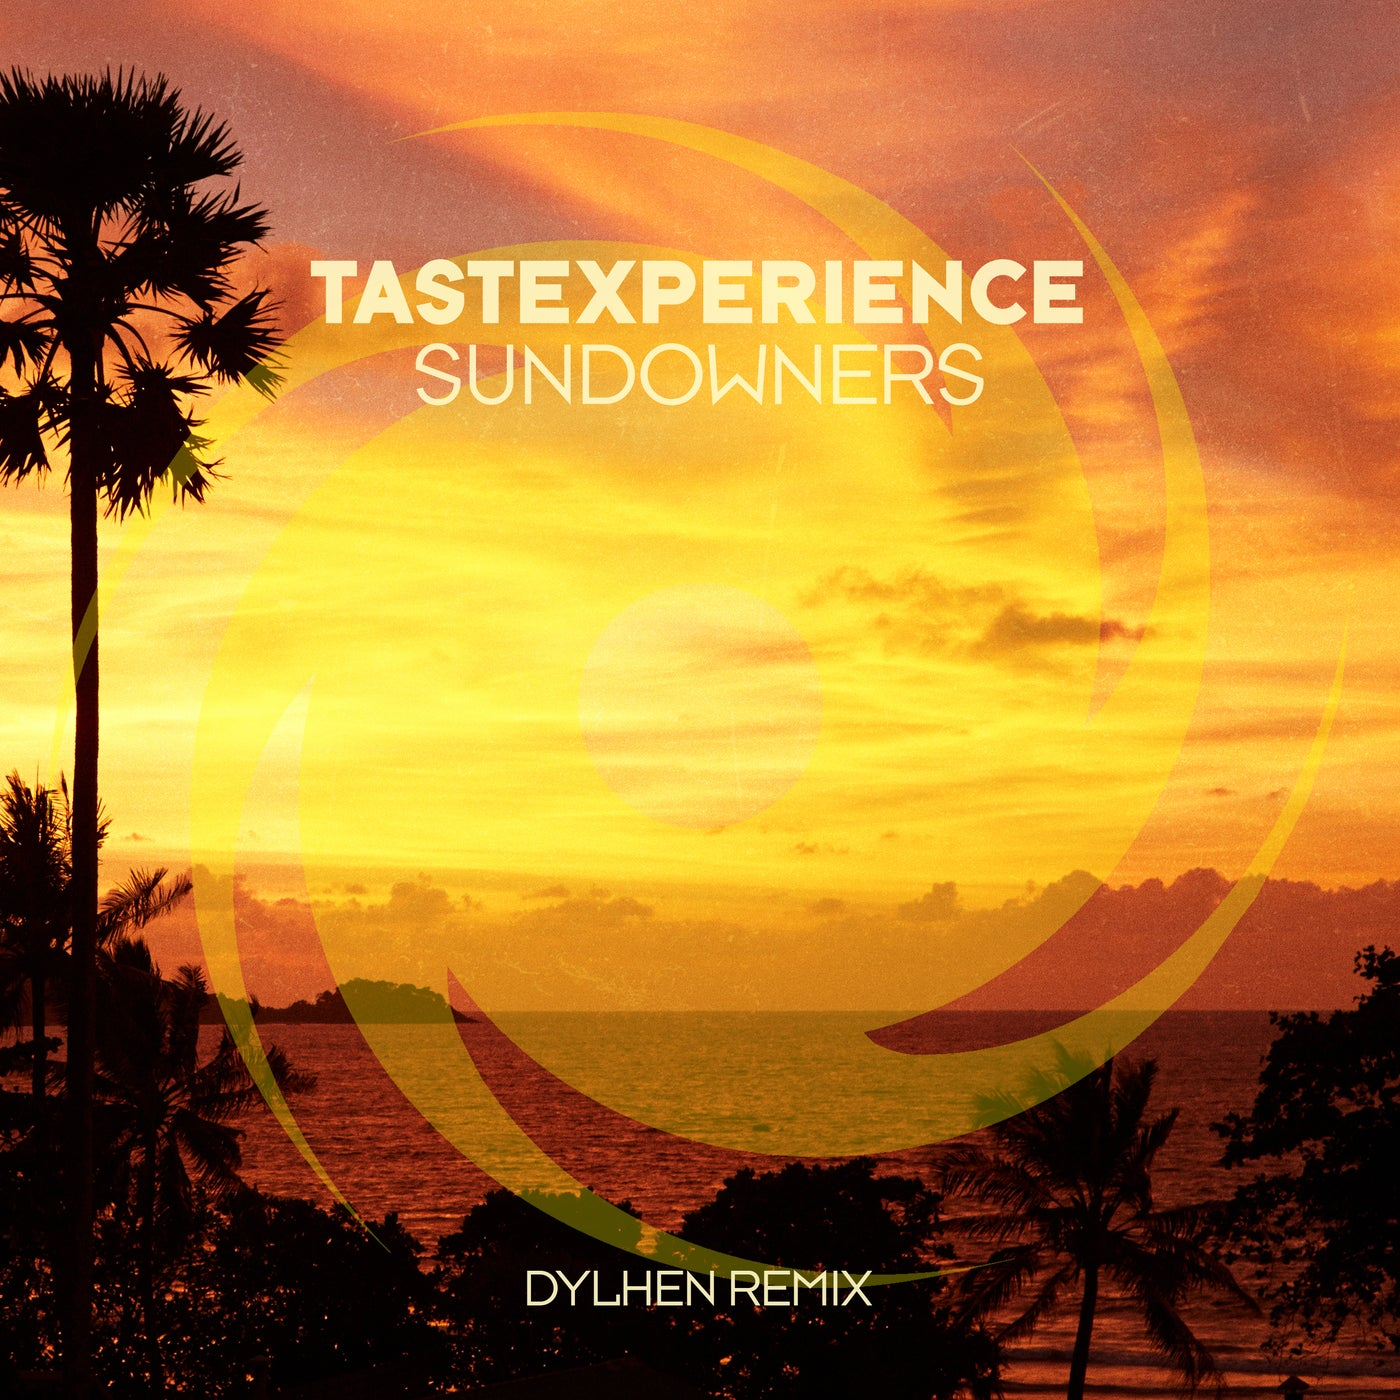 Sundowners (Dylhen Extended Remix)